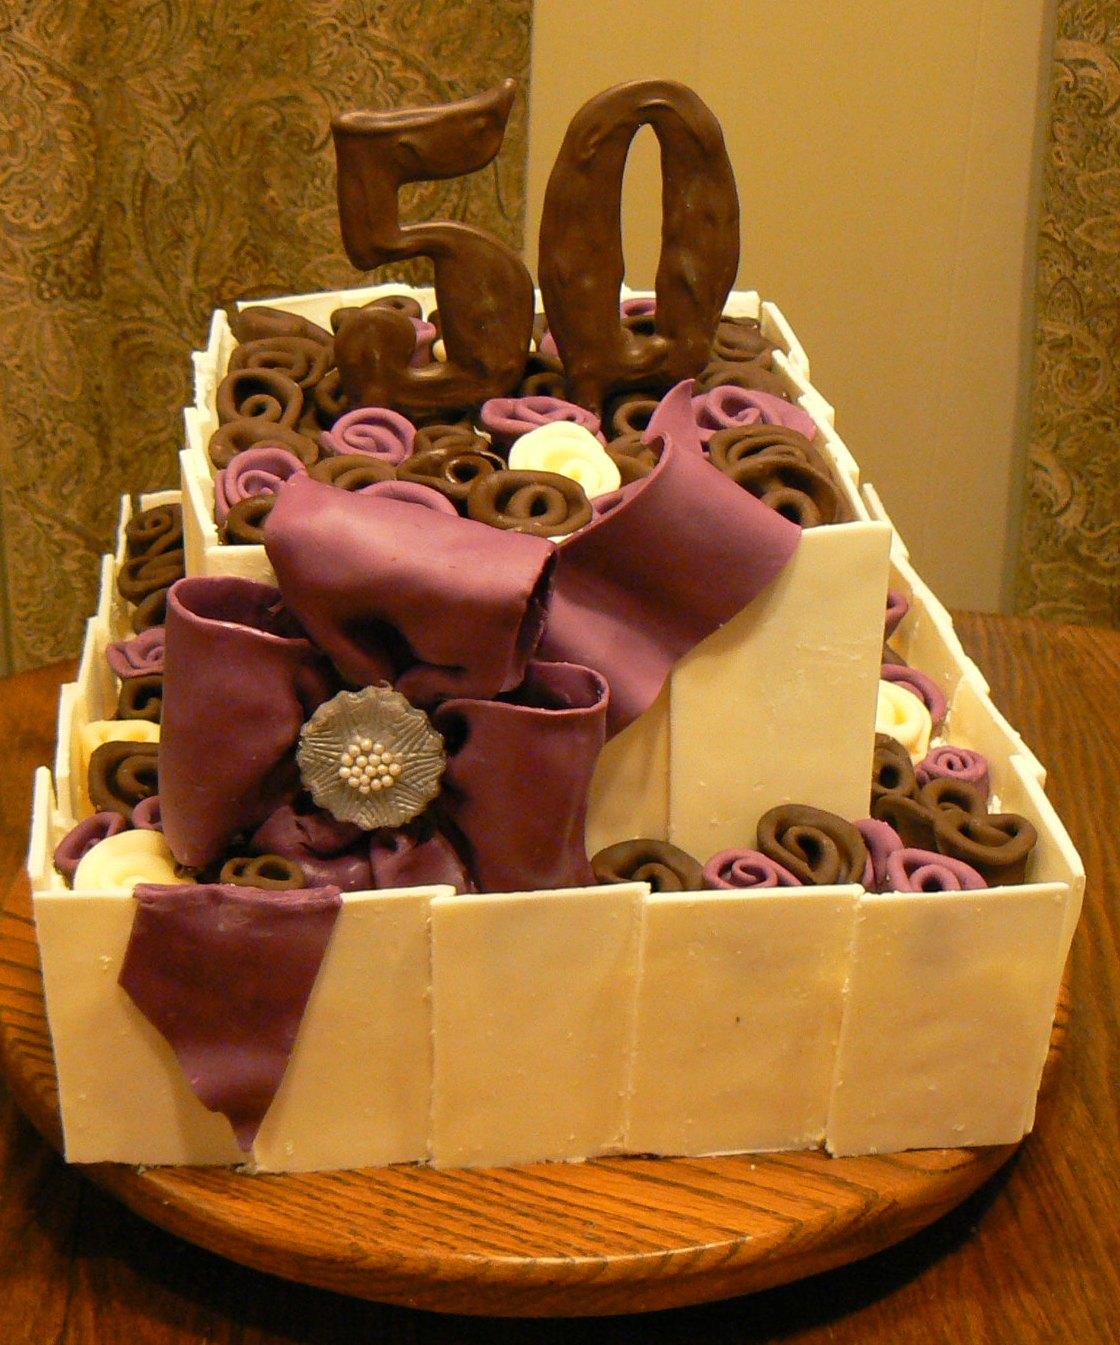 Kelly Roberts Designs 50th Birthday Cake